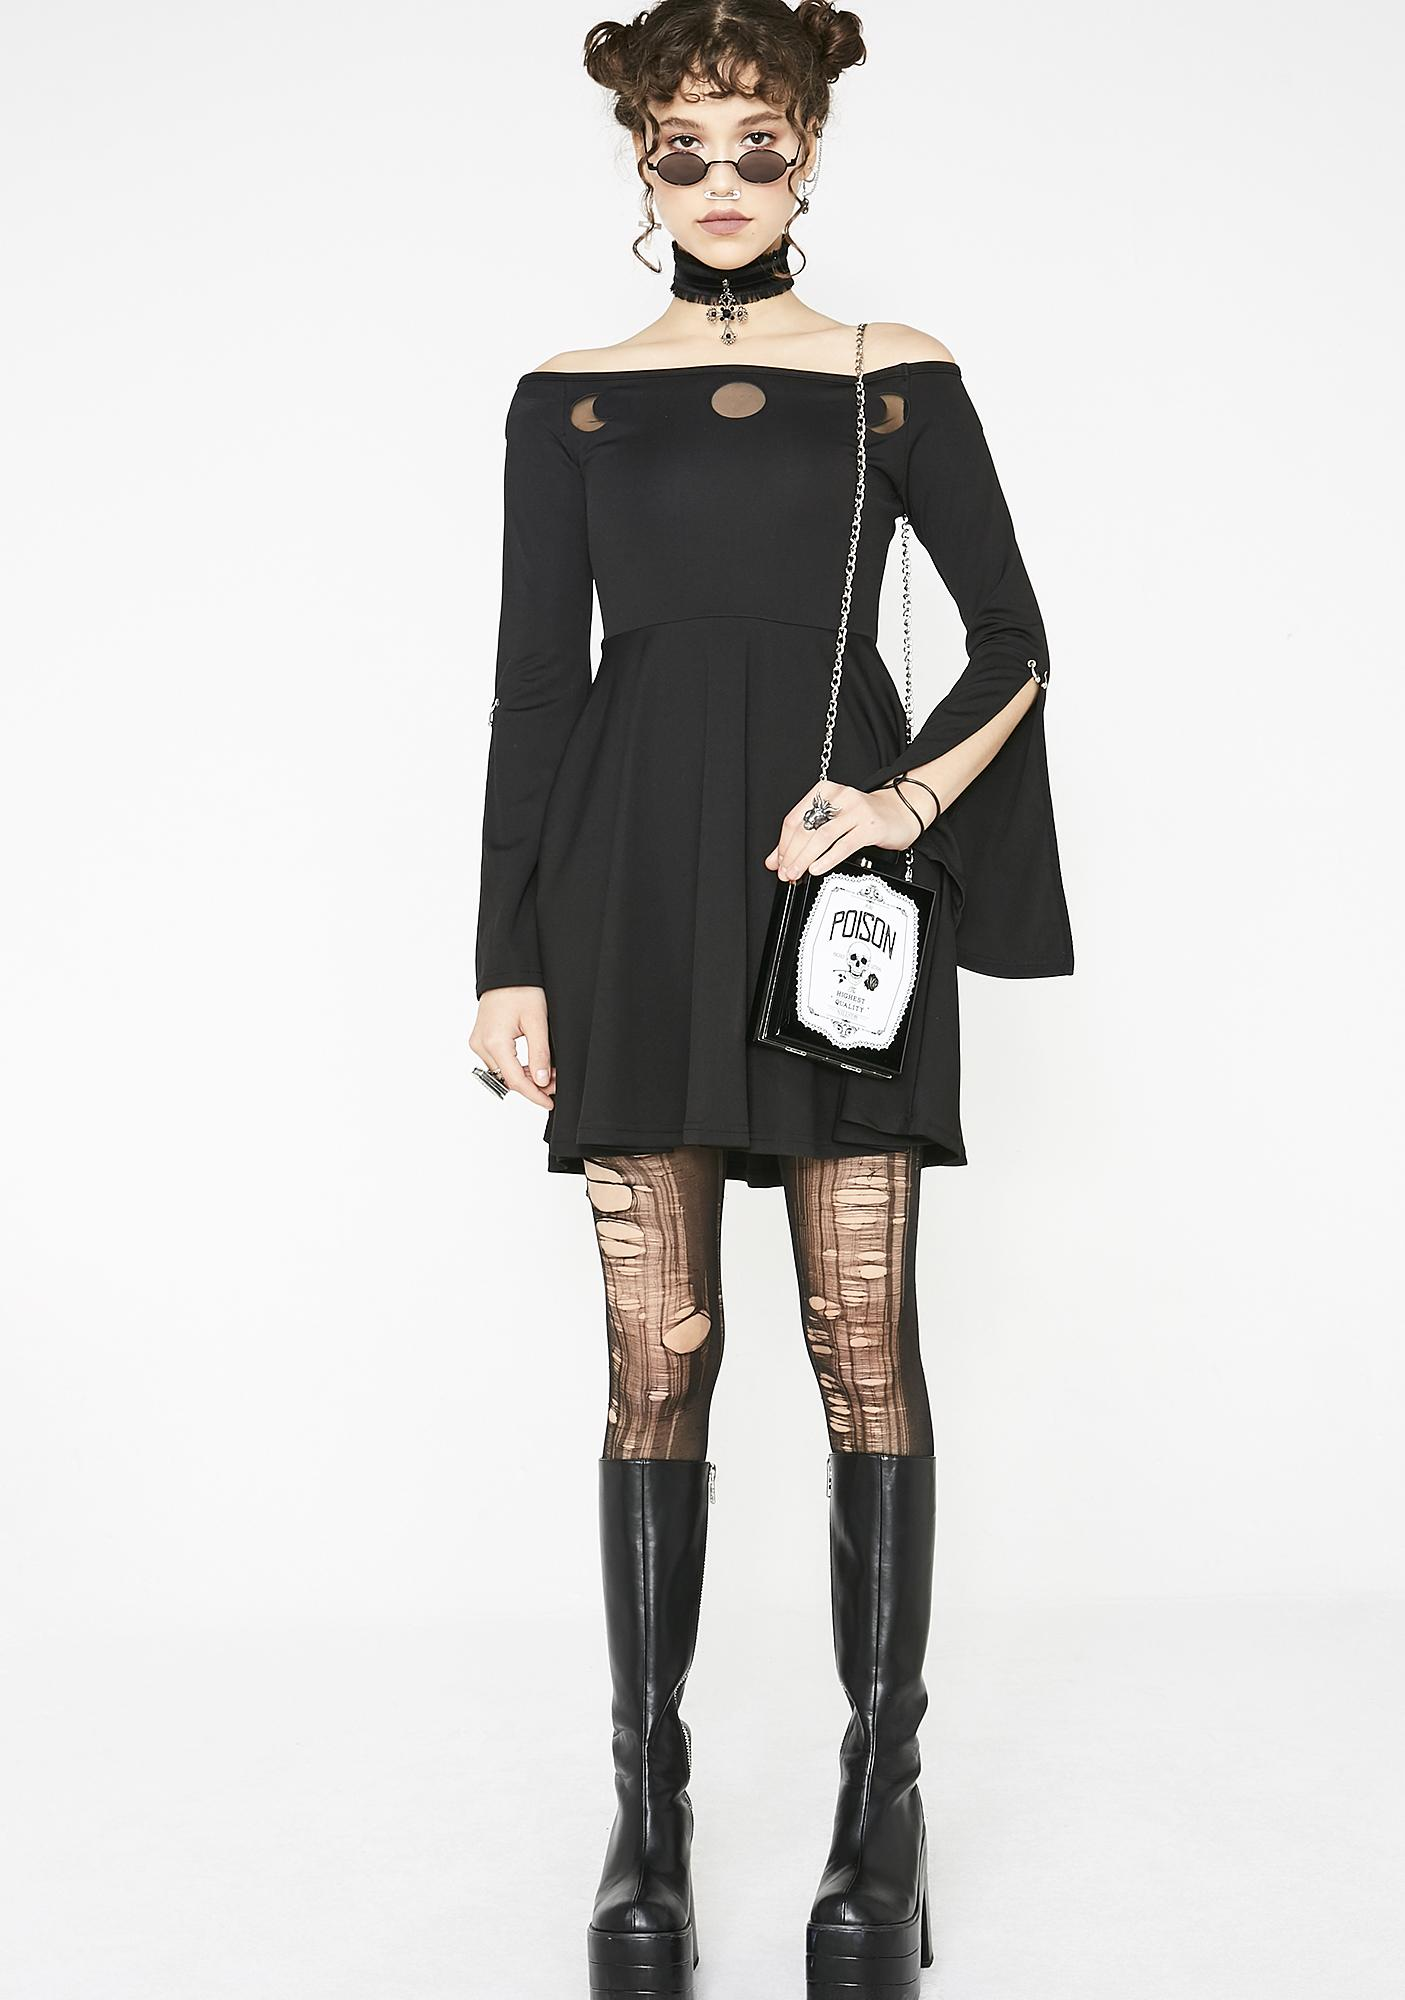 Punk Rave Astrology Series Punk Dress